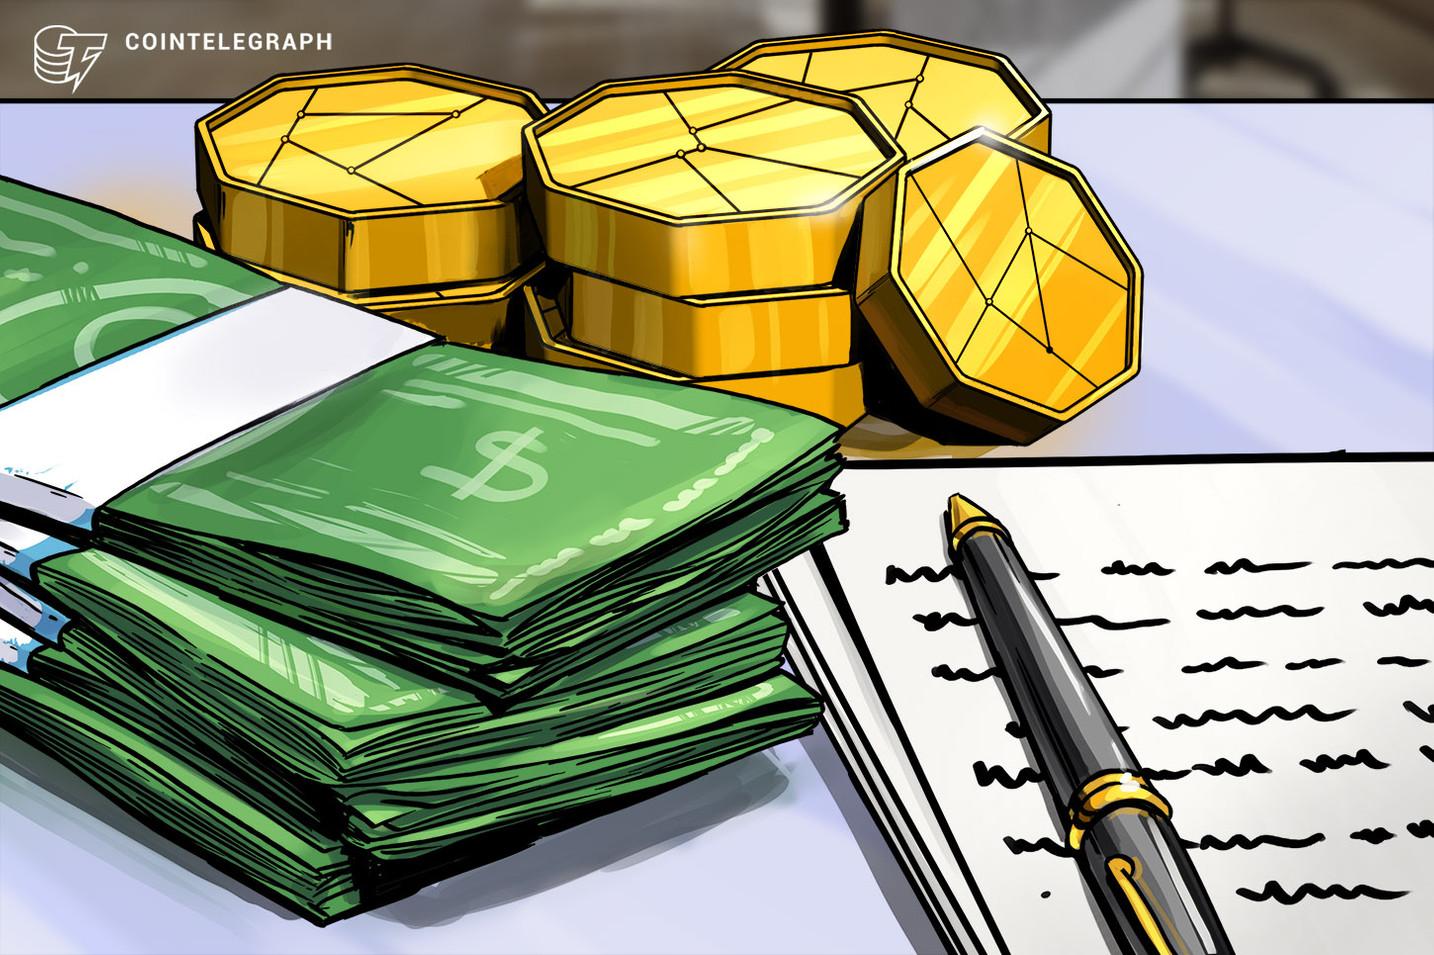 Unconfirmed: Novogratz's Galaxy Digital to Raise $250 Million to Offer Crypto Loans